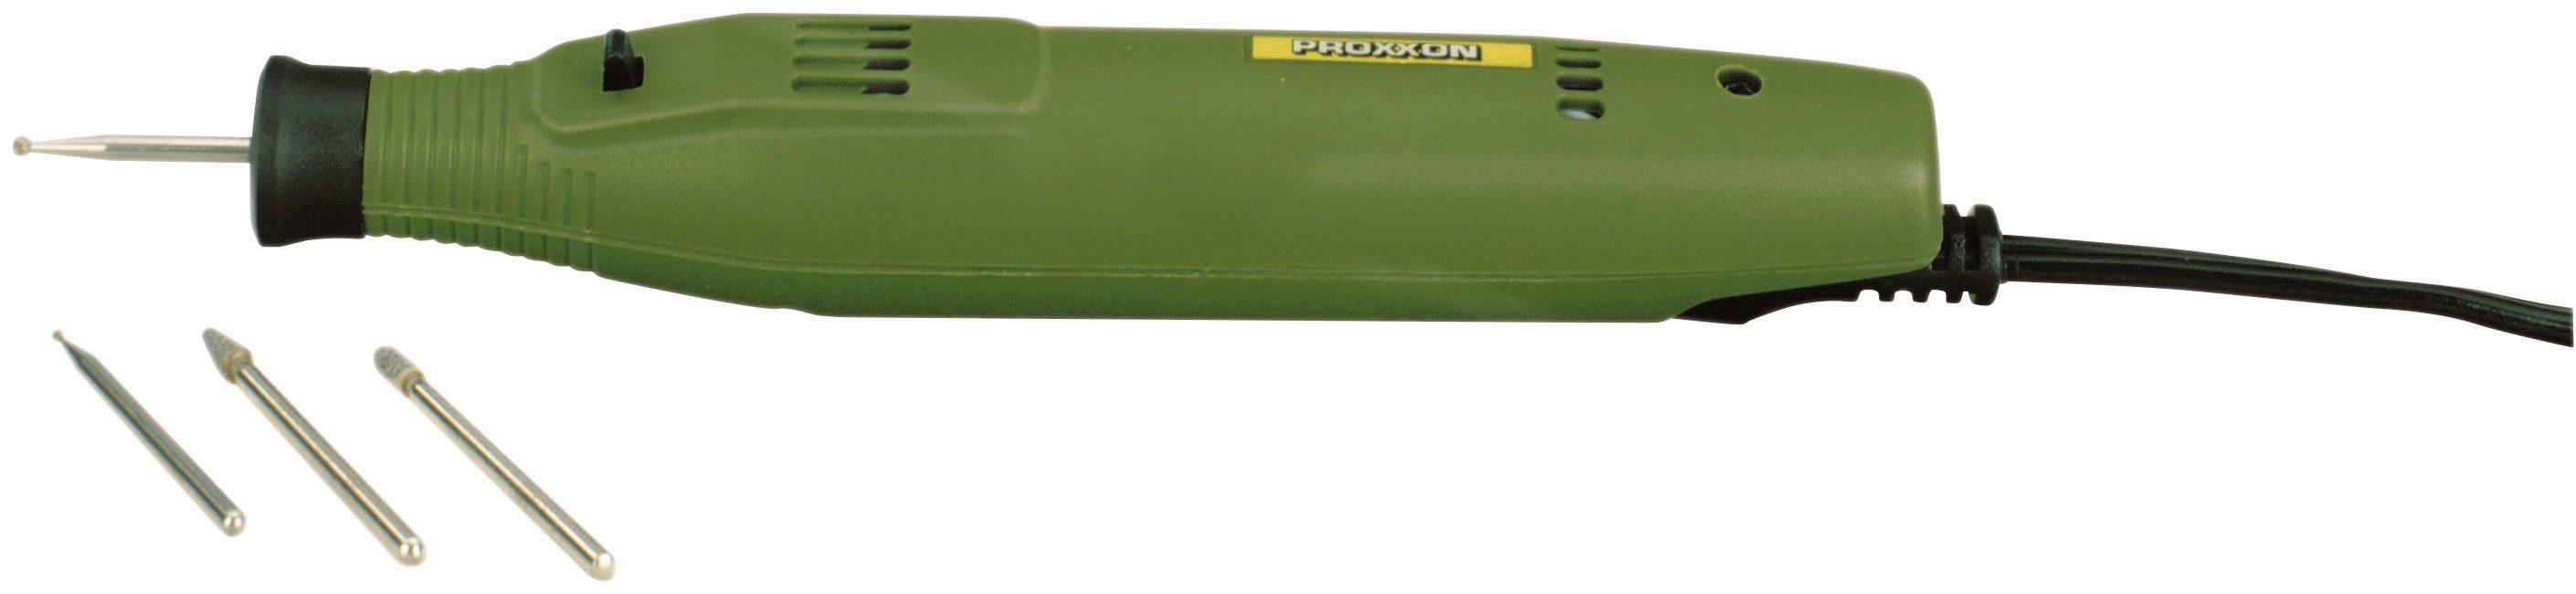 PROXXON Gravierset »Graviergerät GG 12«, 12-18 V